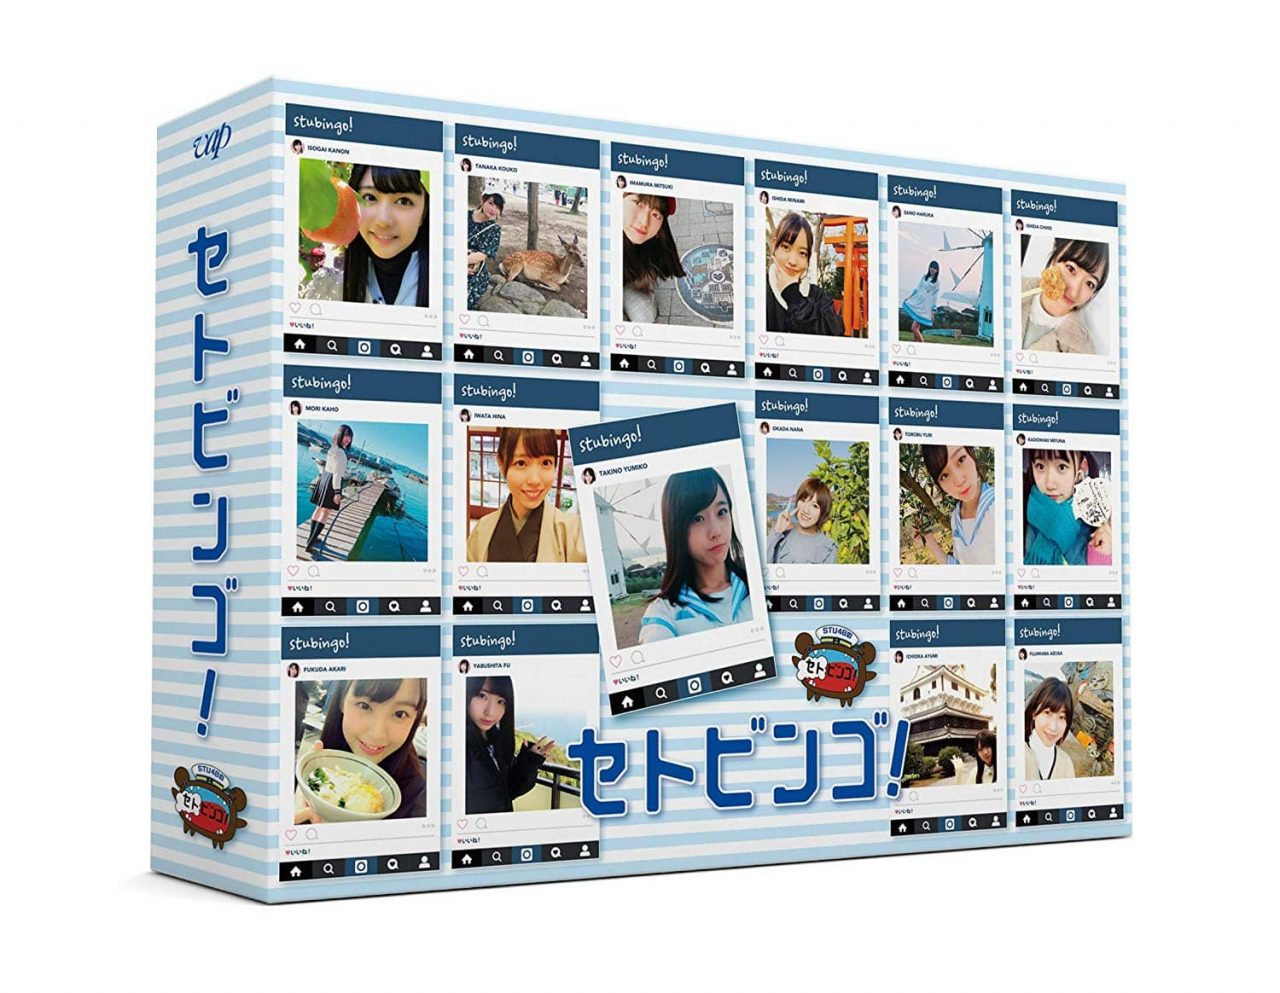 STU48のセトビンゴ! [DVD][Blu-ray]